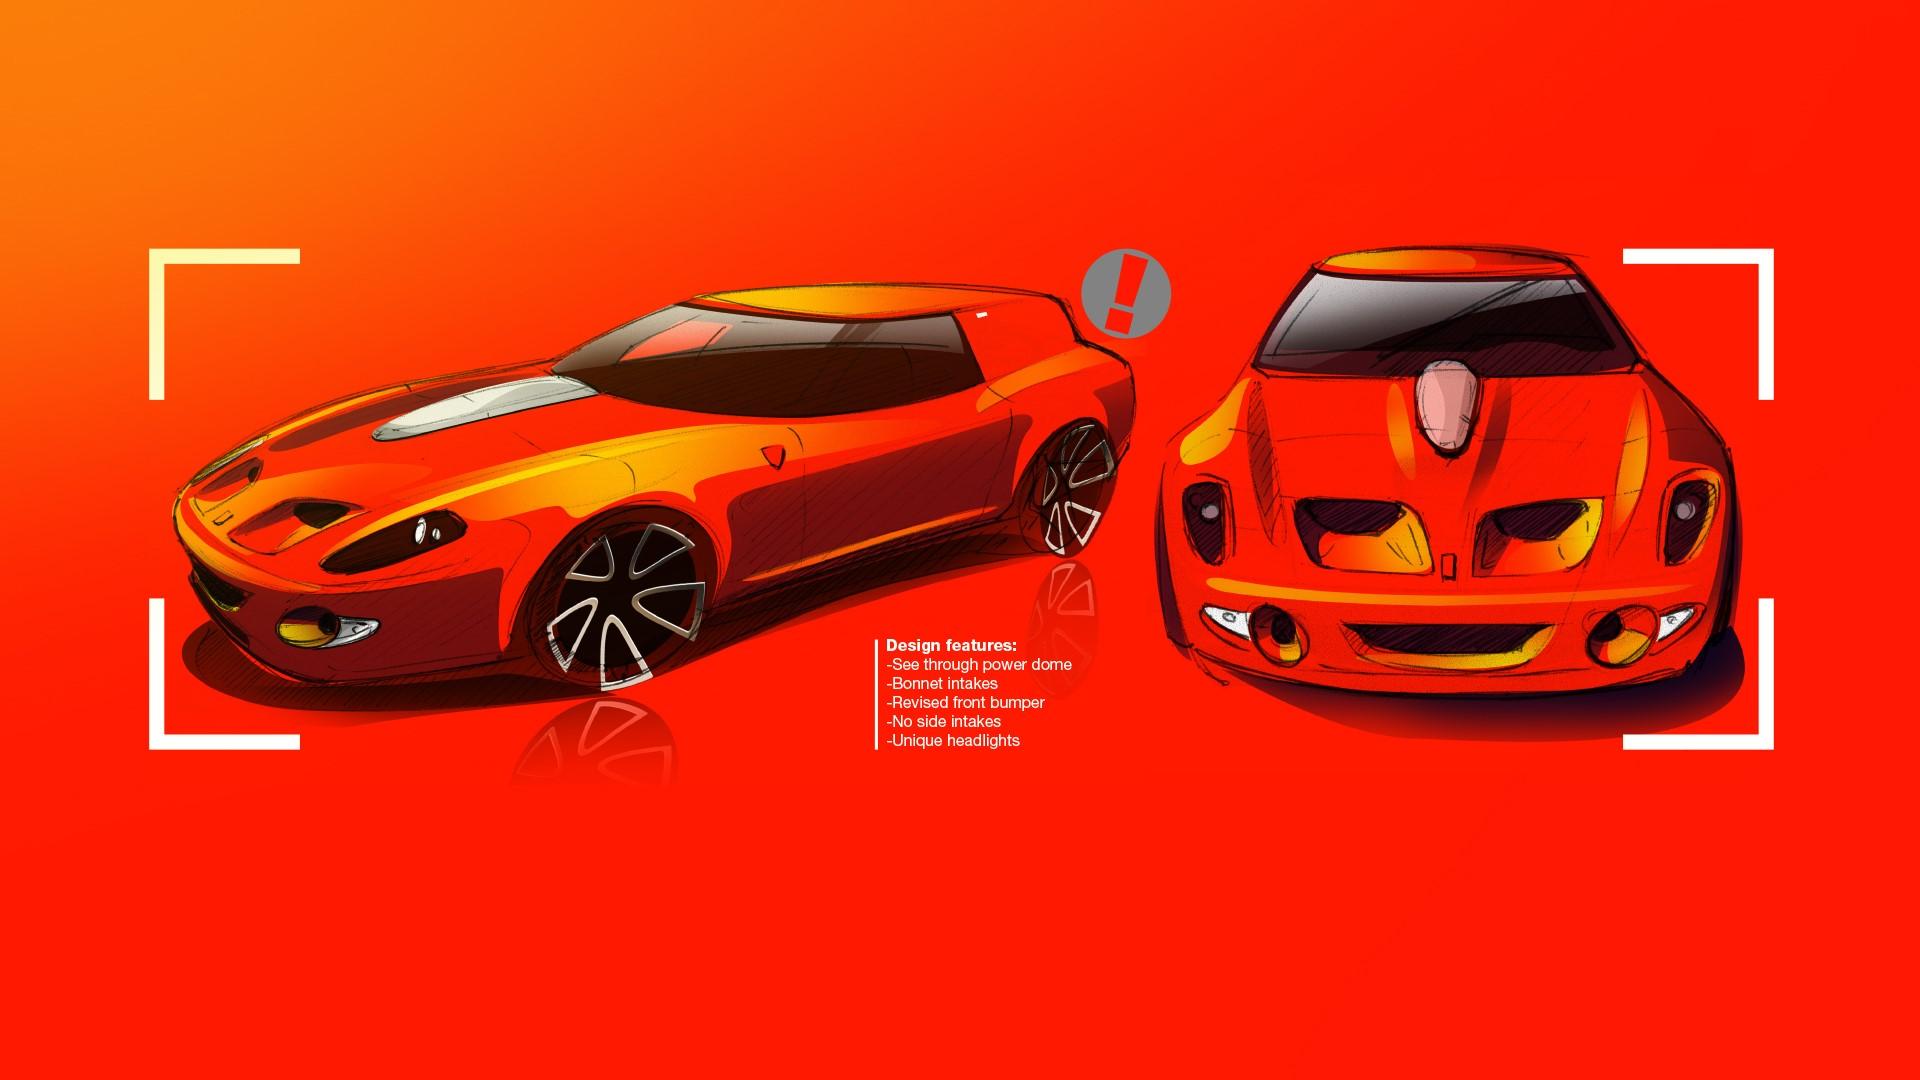 18 12 26 Niels van Roij Design - Breadvan Hommage ideation board 007